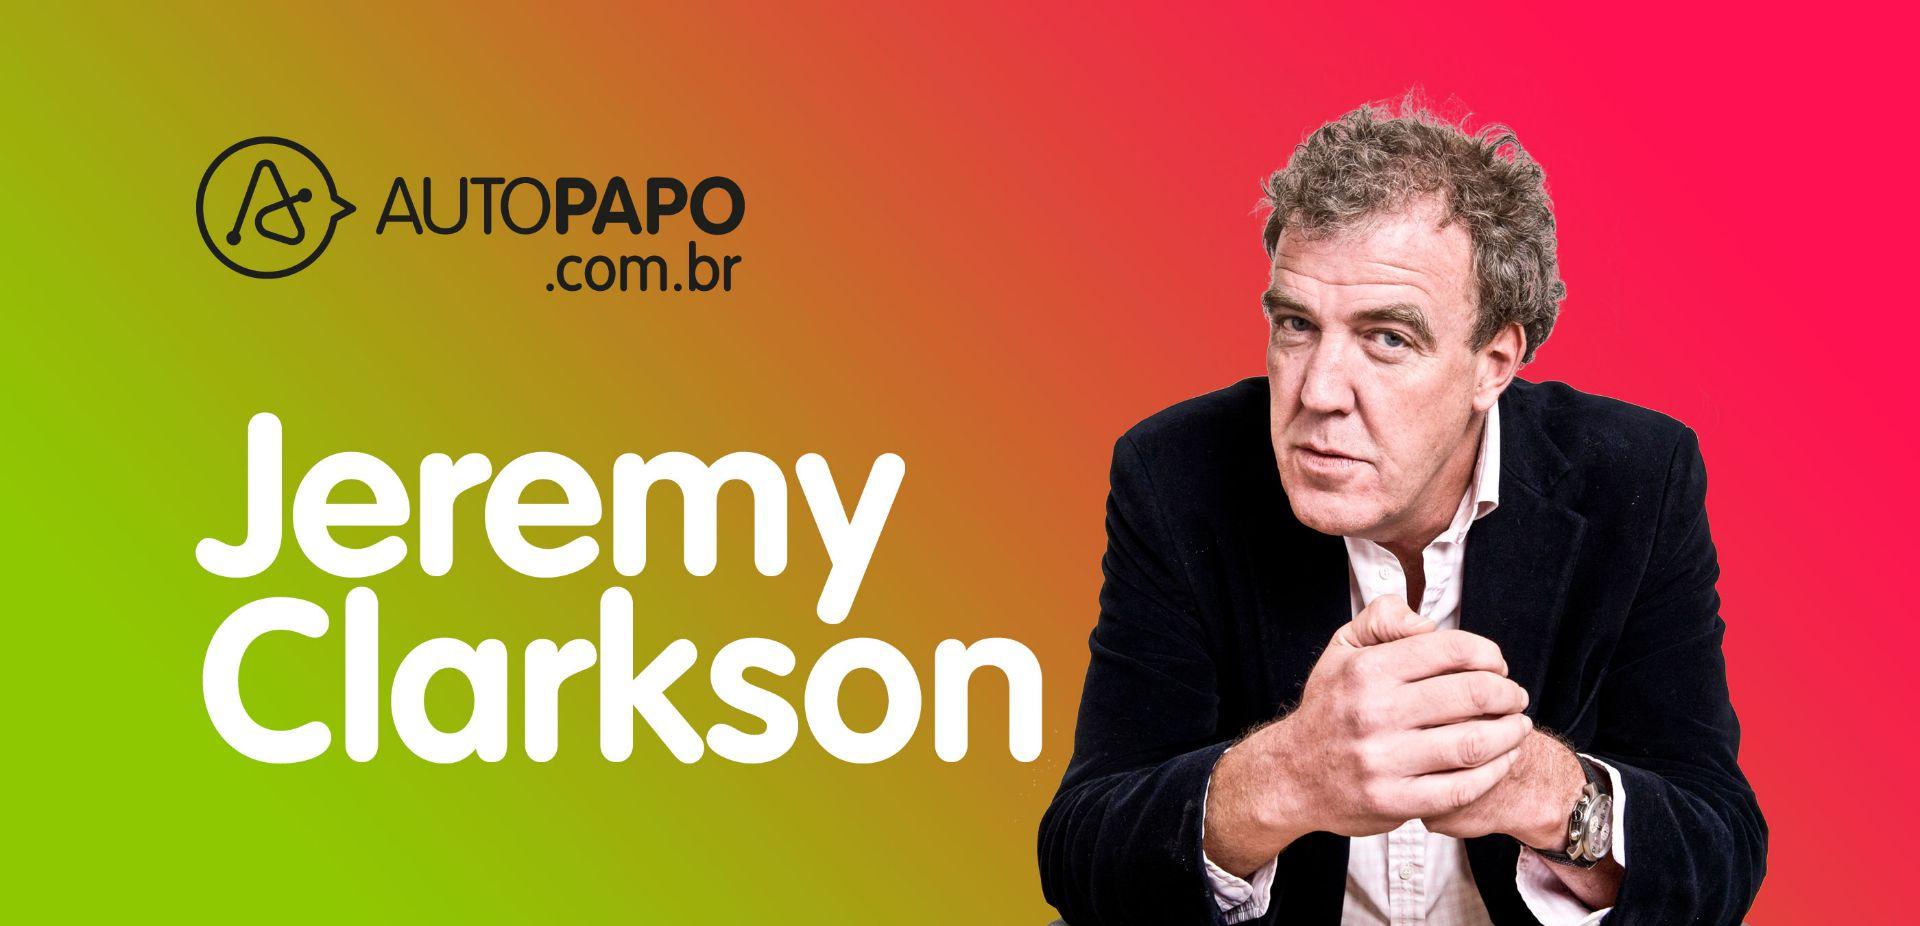 Jeremy Clarkson no AutoPapo